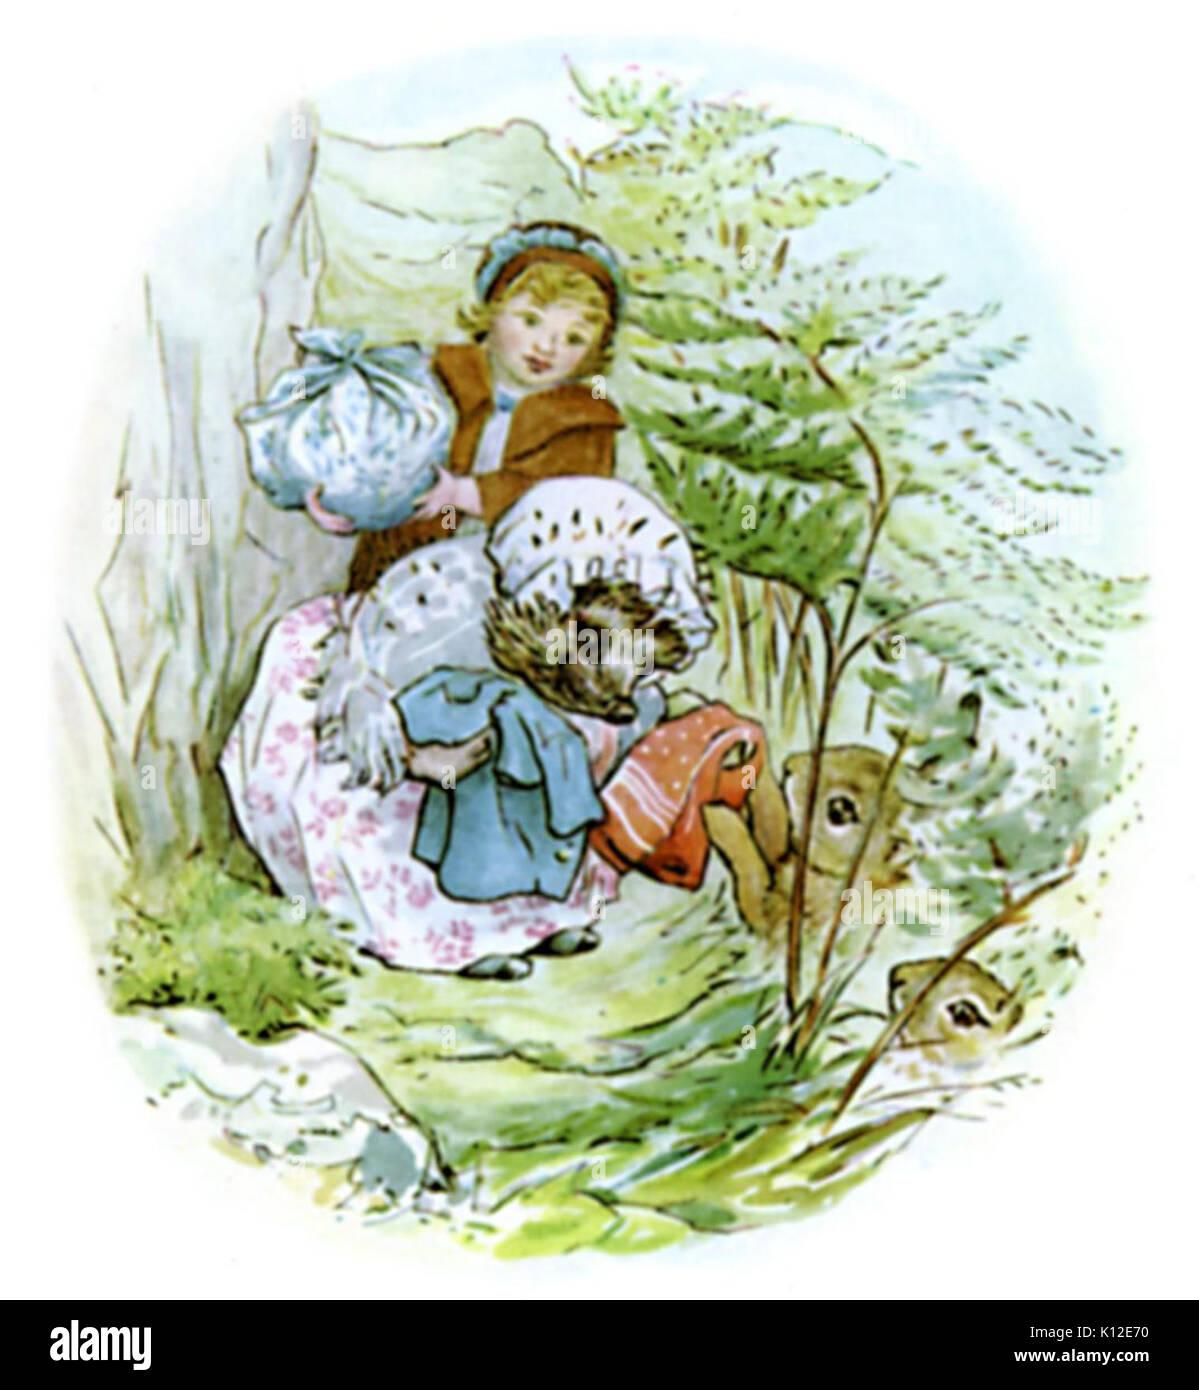 Beatrix Potter, Mrs Tiggy Winkle, Peter Rabbit - Stock Image